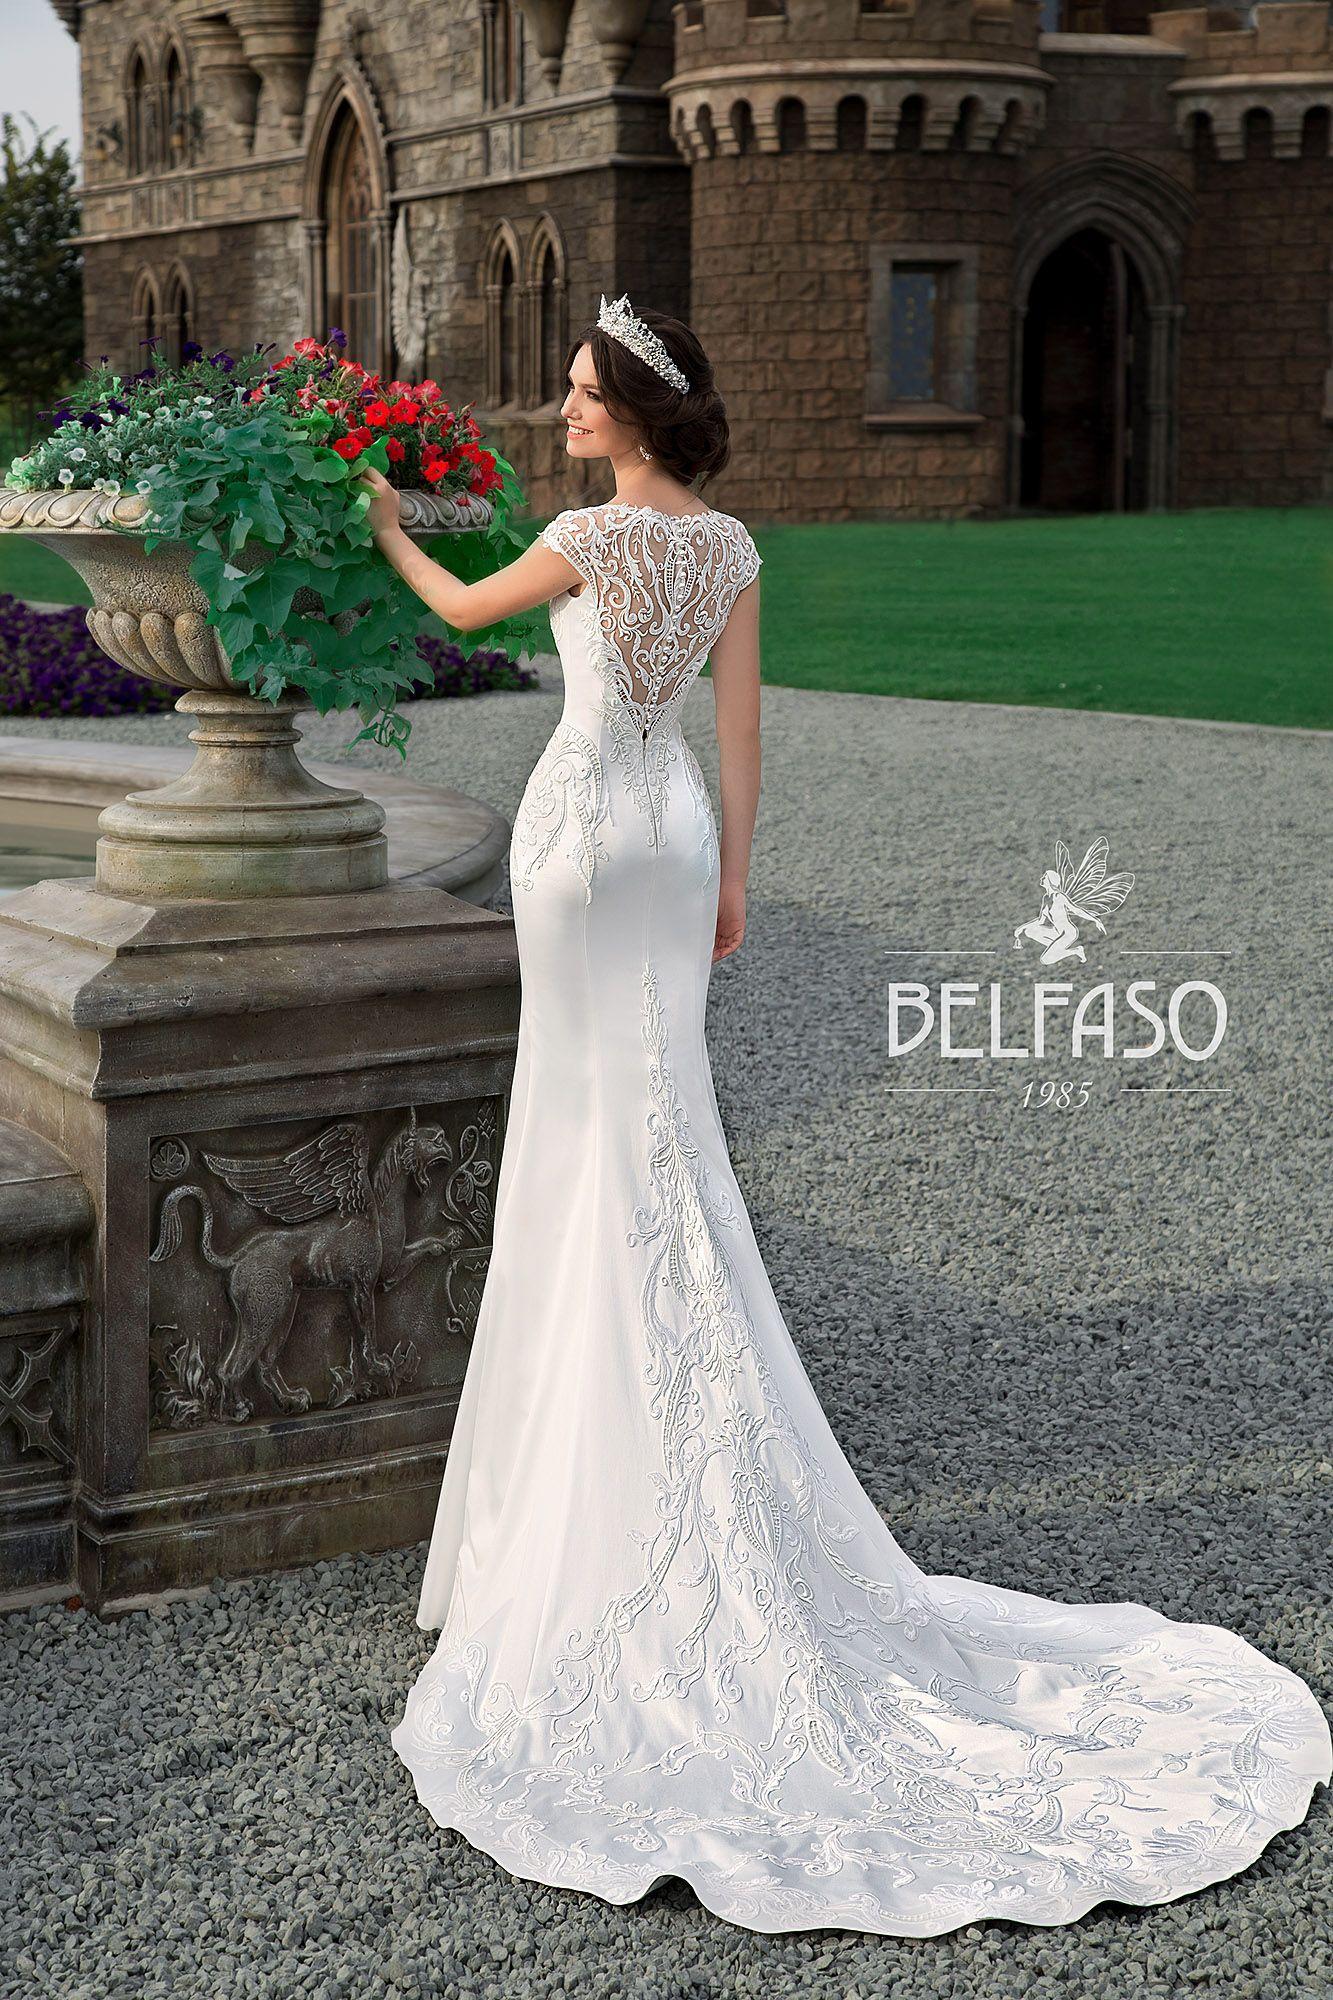 Wedding Dresses Simple Short Belfaso Bridal Designer Belfaso Wedding Gowns Wedding Dresses Bridal Wedding Dresses Ball Dresses Simple Wedding Dress Short [ 2000 x 1333 Pixel ]